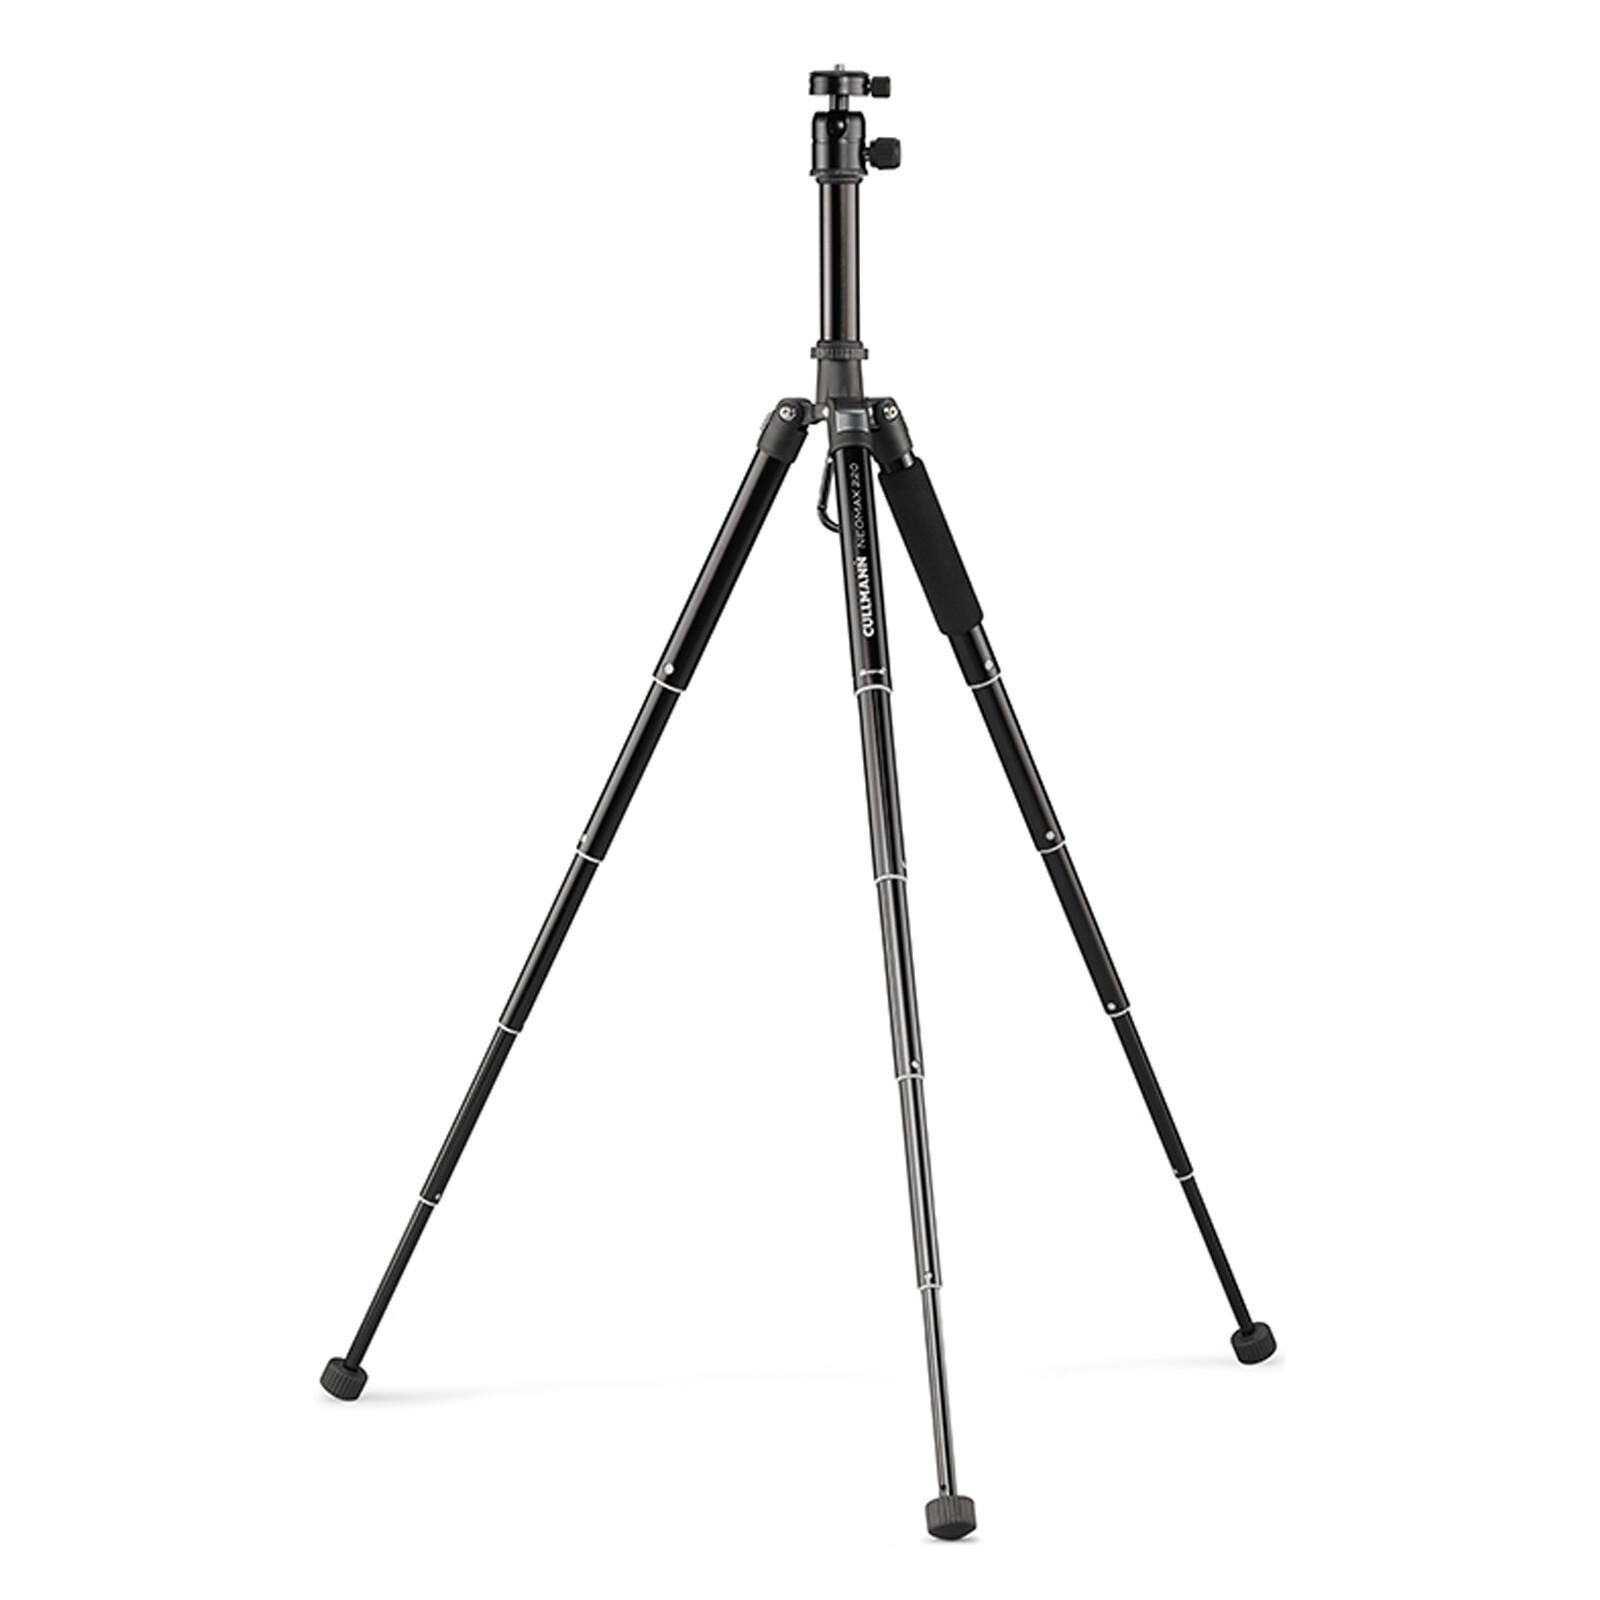 Cullmann Neomax 220 Stativ schwarz